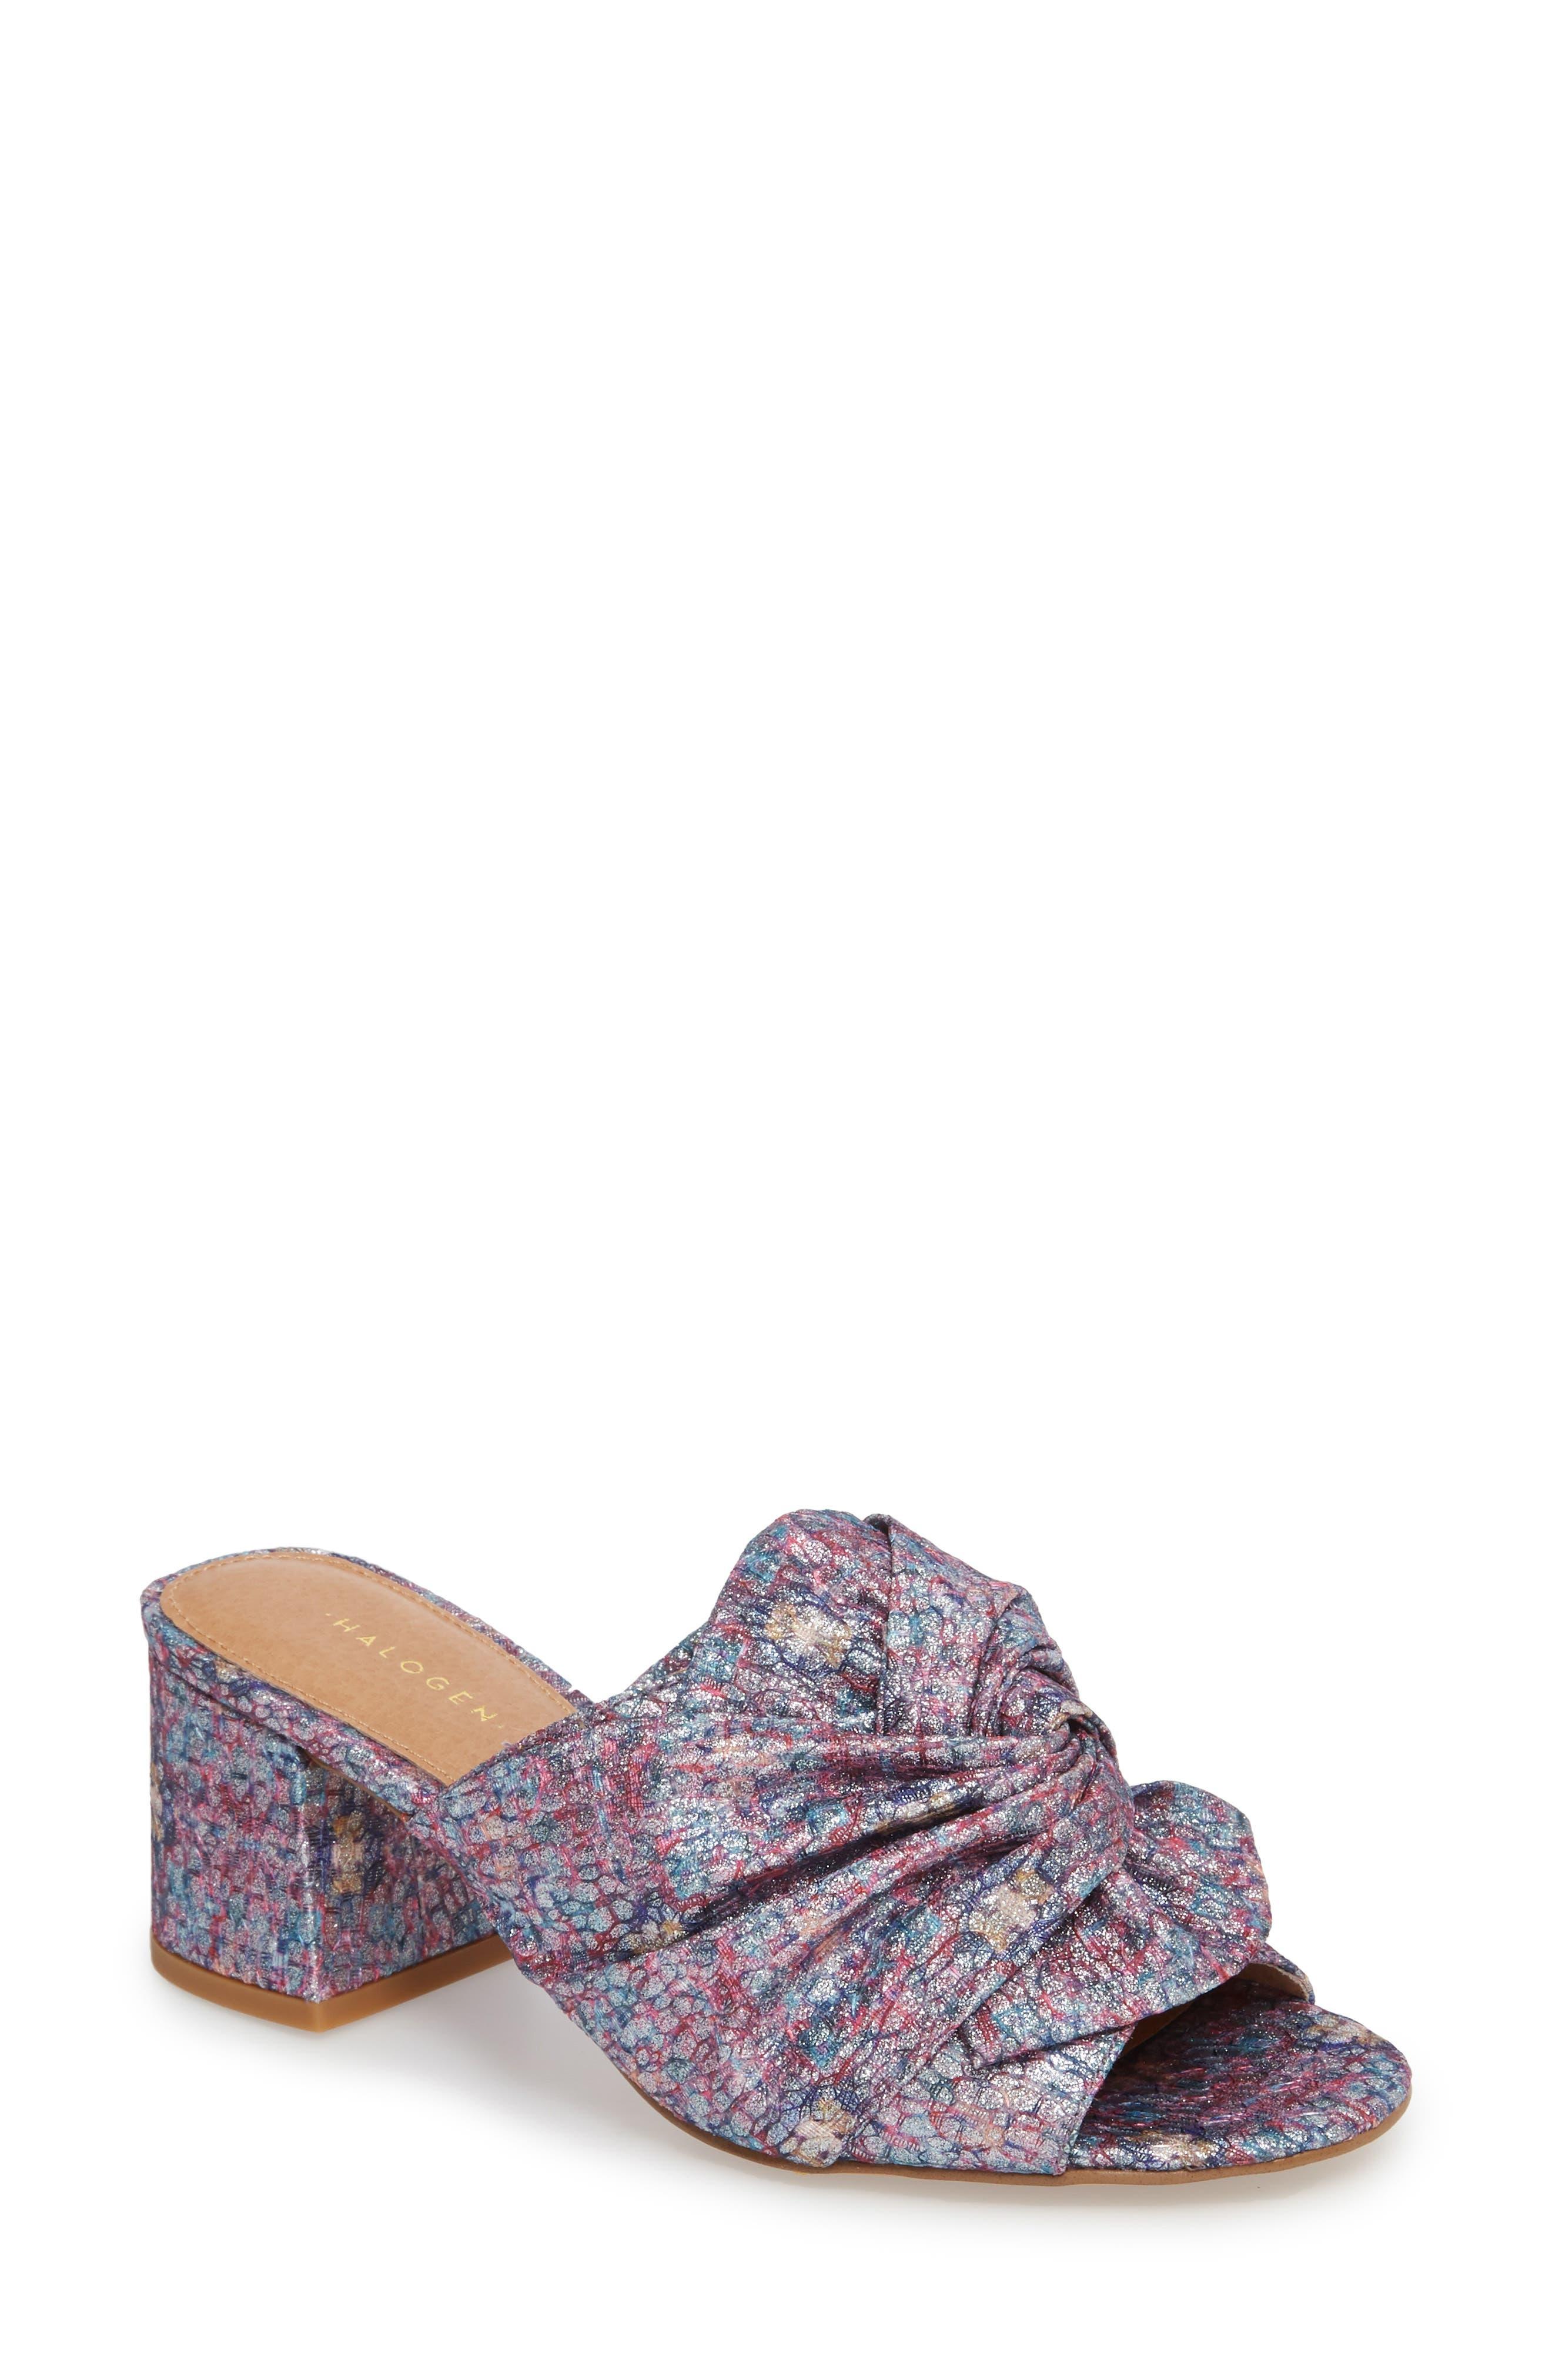 Farrah Sandal,                         Main,                         color, Bright Confetti Fabric